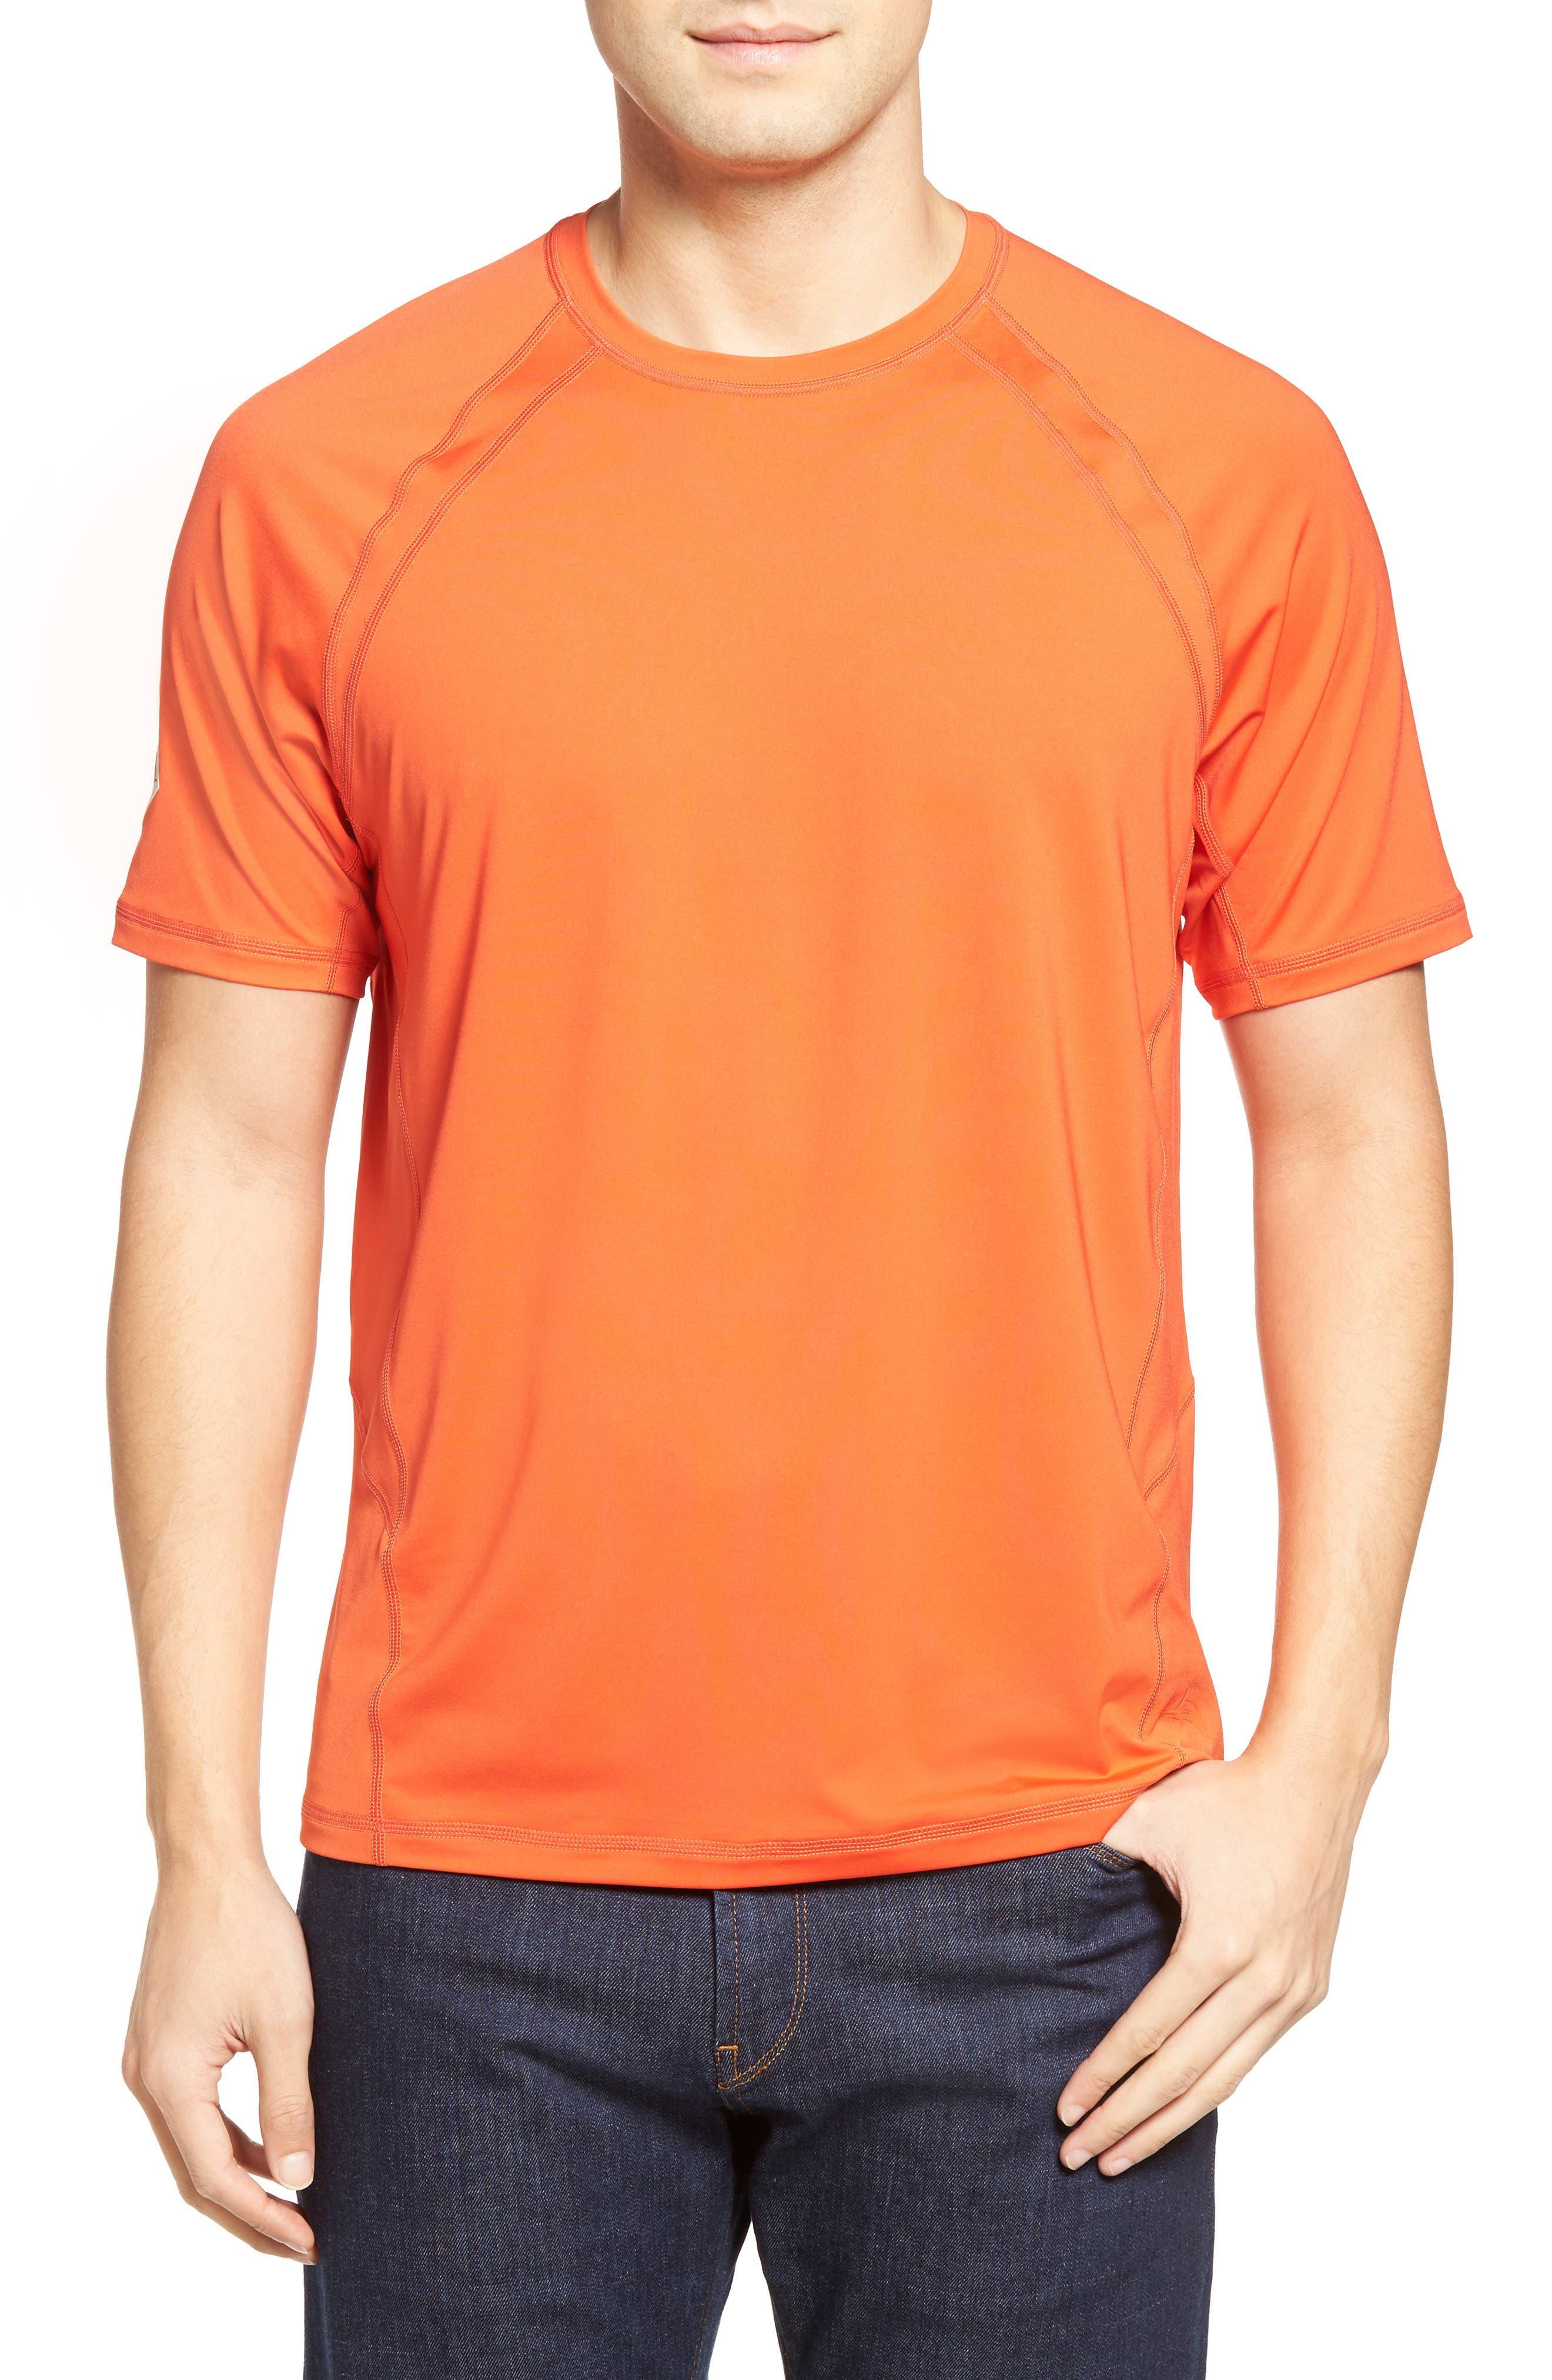 Alternate Image 1 Selected - Tommy Bahama Surf Chaser Crewneck T-Shirt